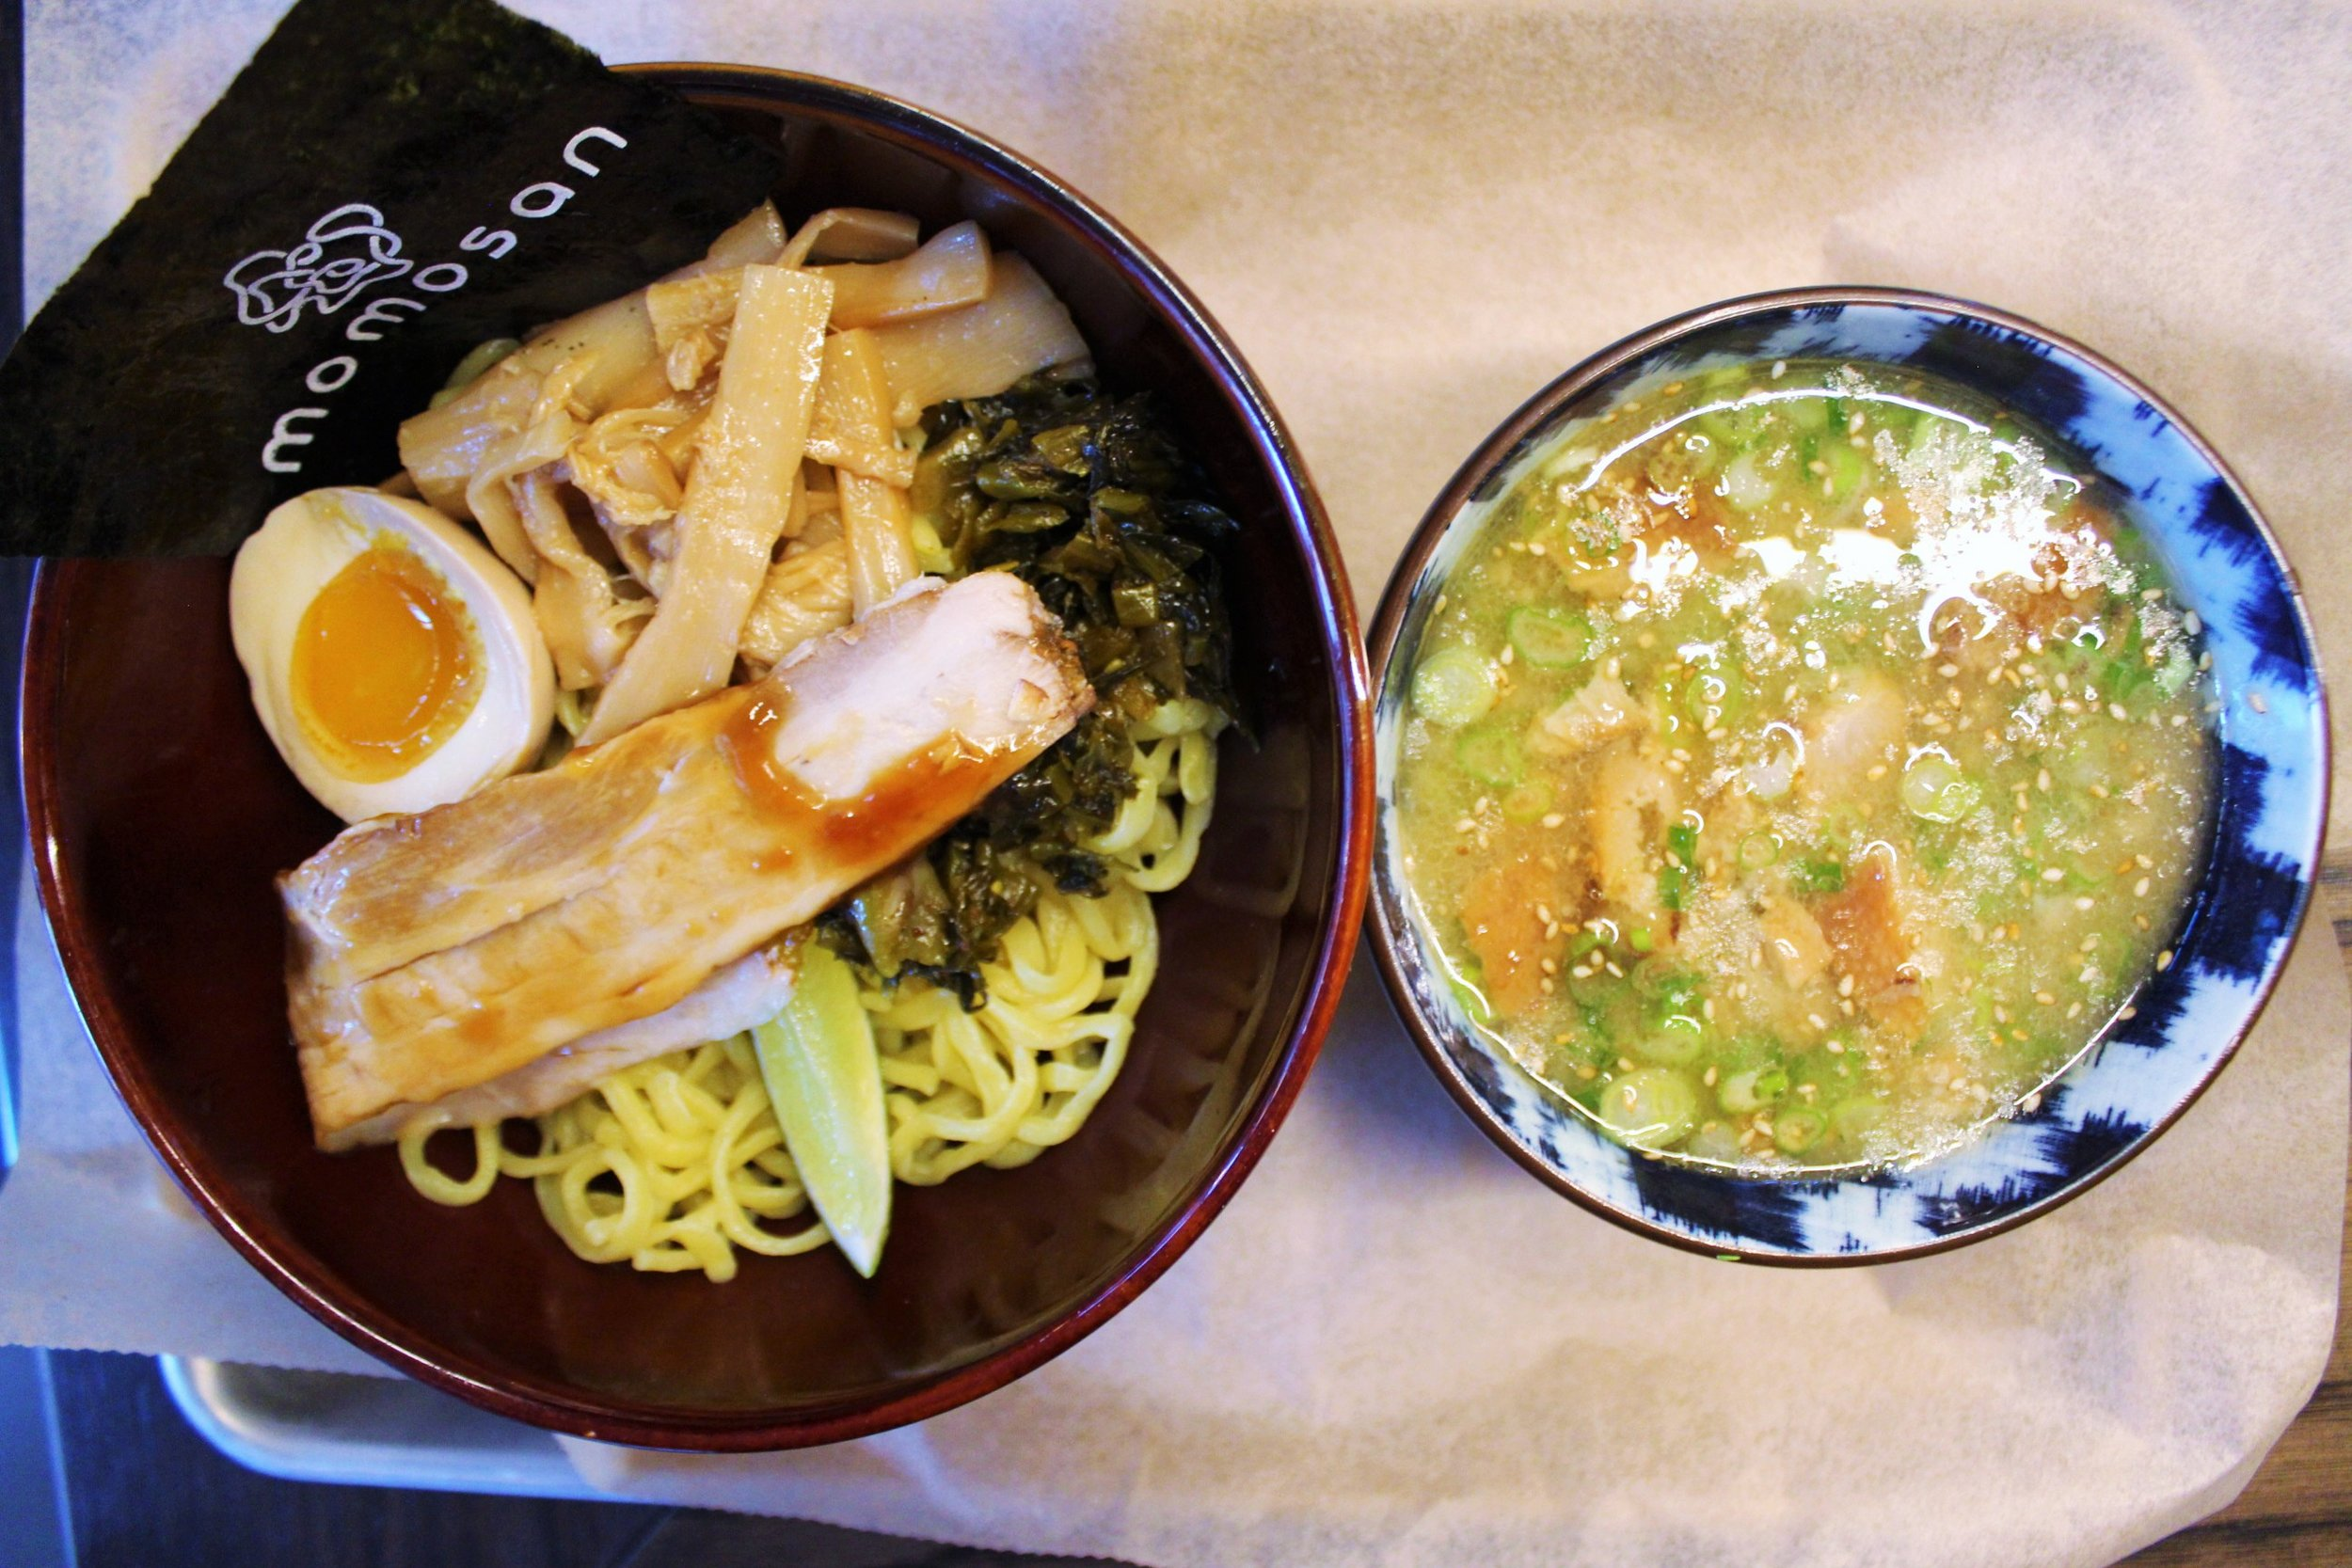 Tsukemen: Tonkotsu Soup, Pork Chashu, Aji-tama, Menma, Takana, Toasted Nori, Garlic Oil, Soy Tare, Lime at Momosan